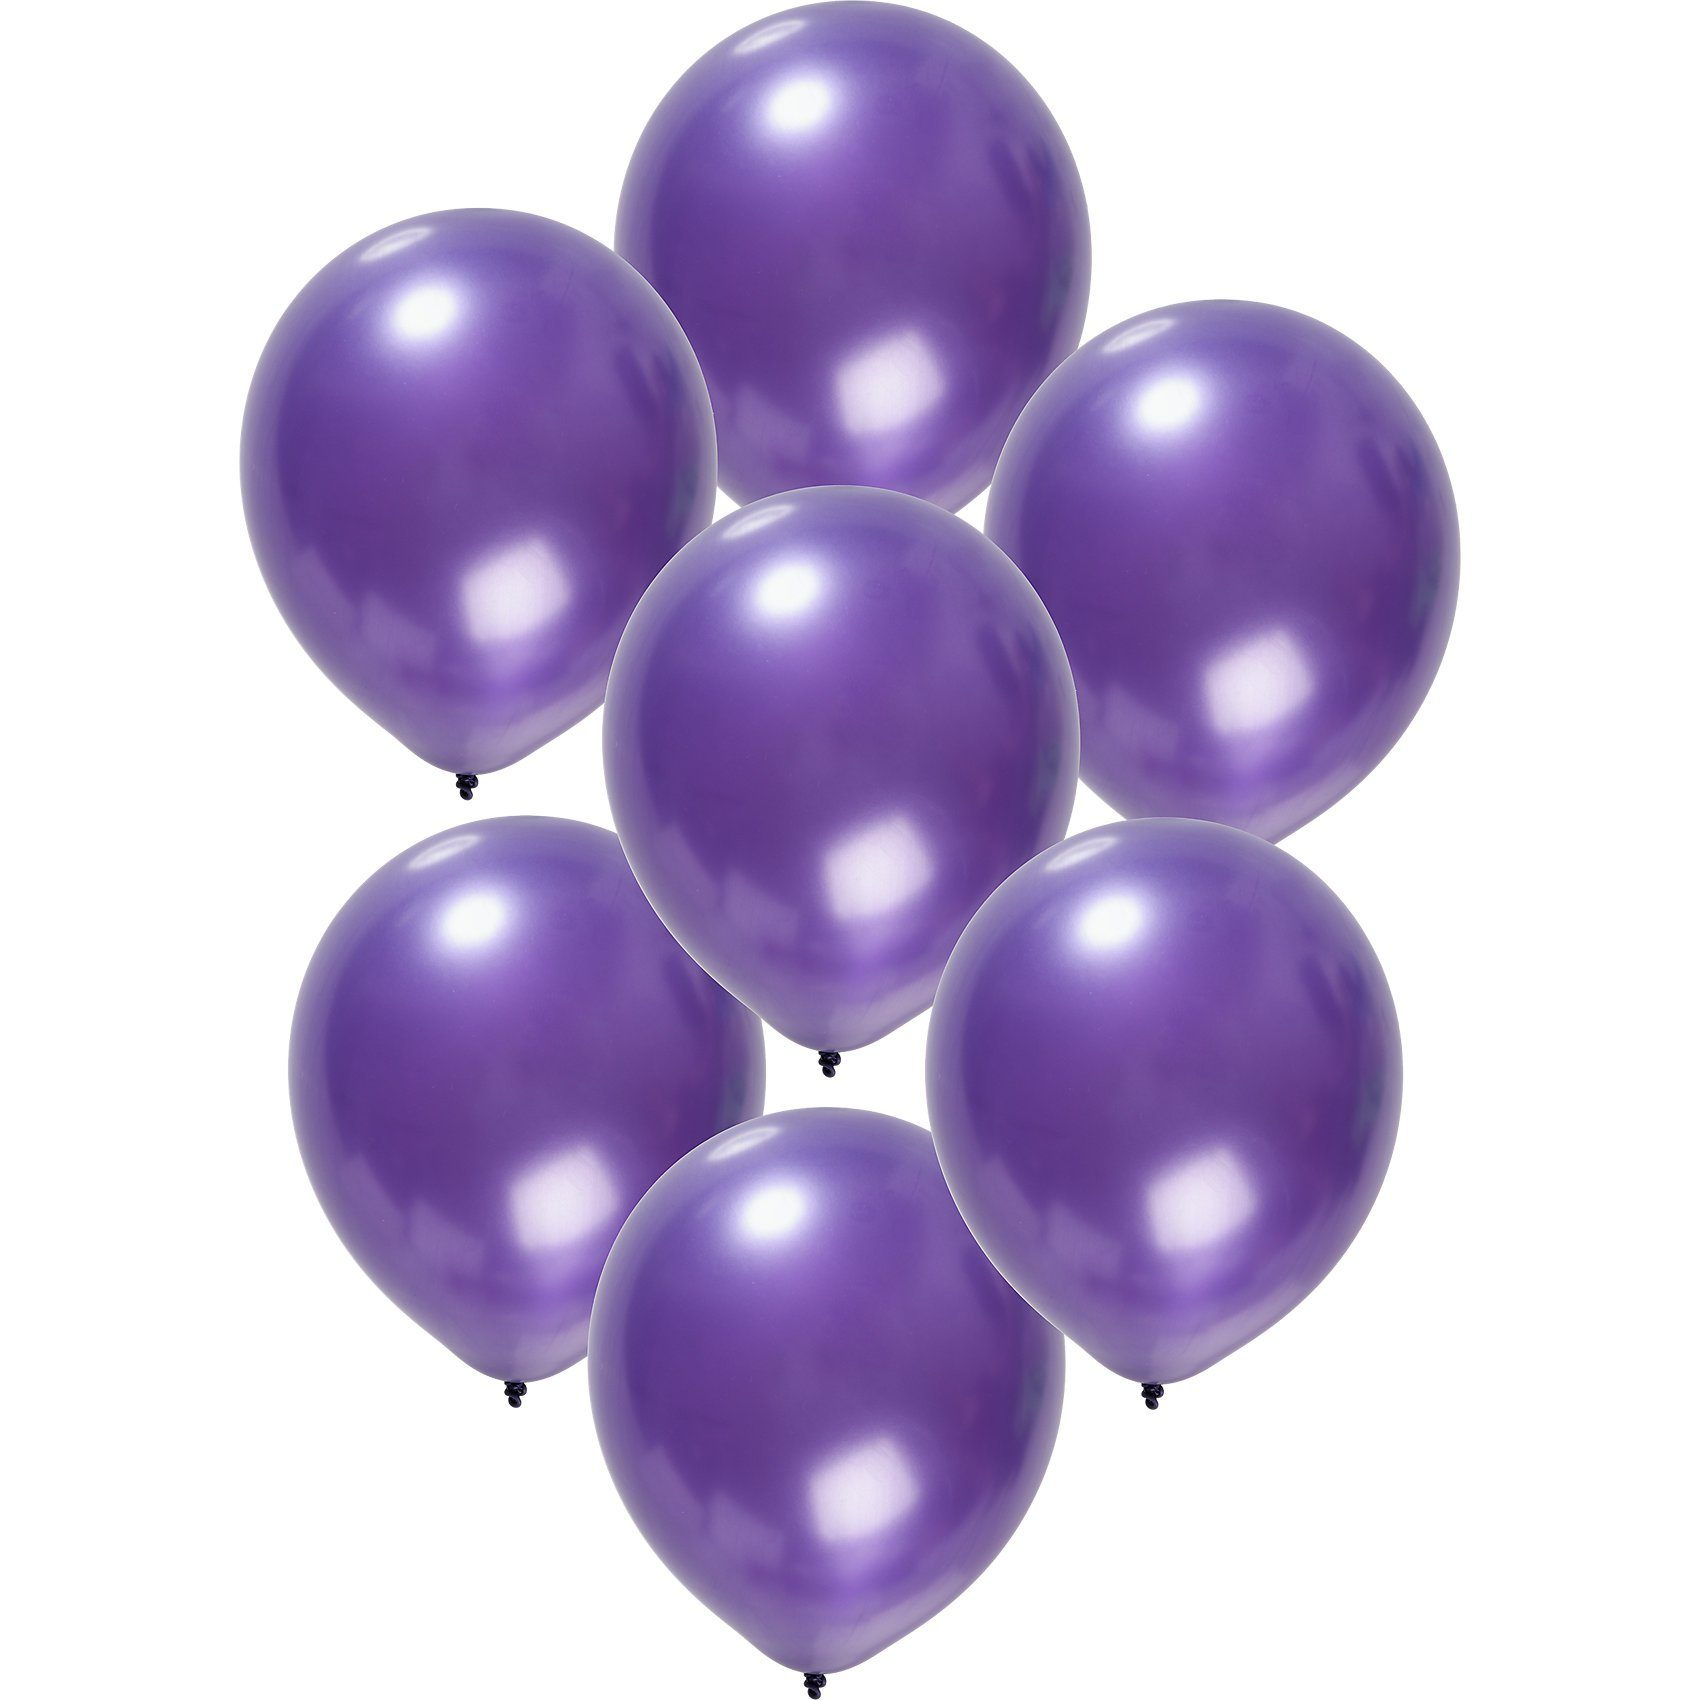 Luftballons metallic lila 30 cm, 50 Stück